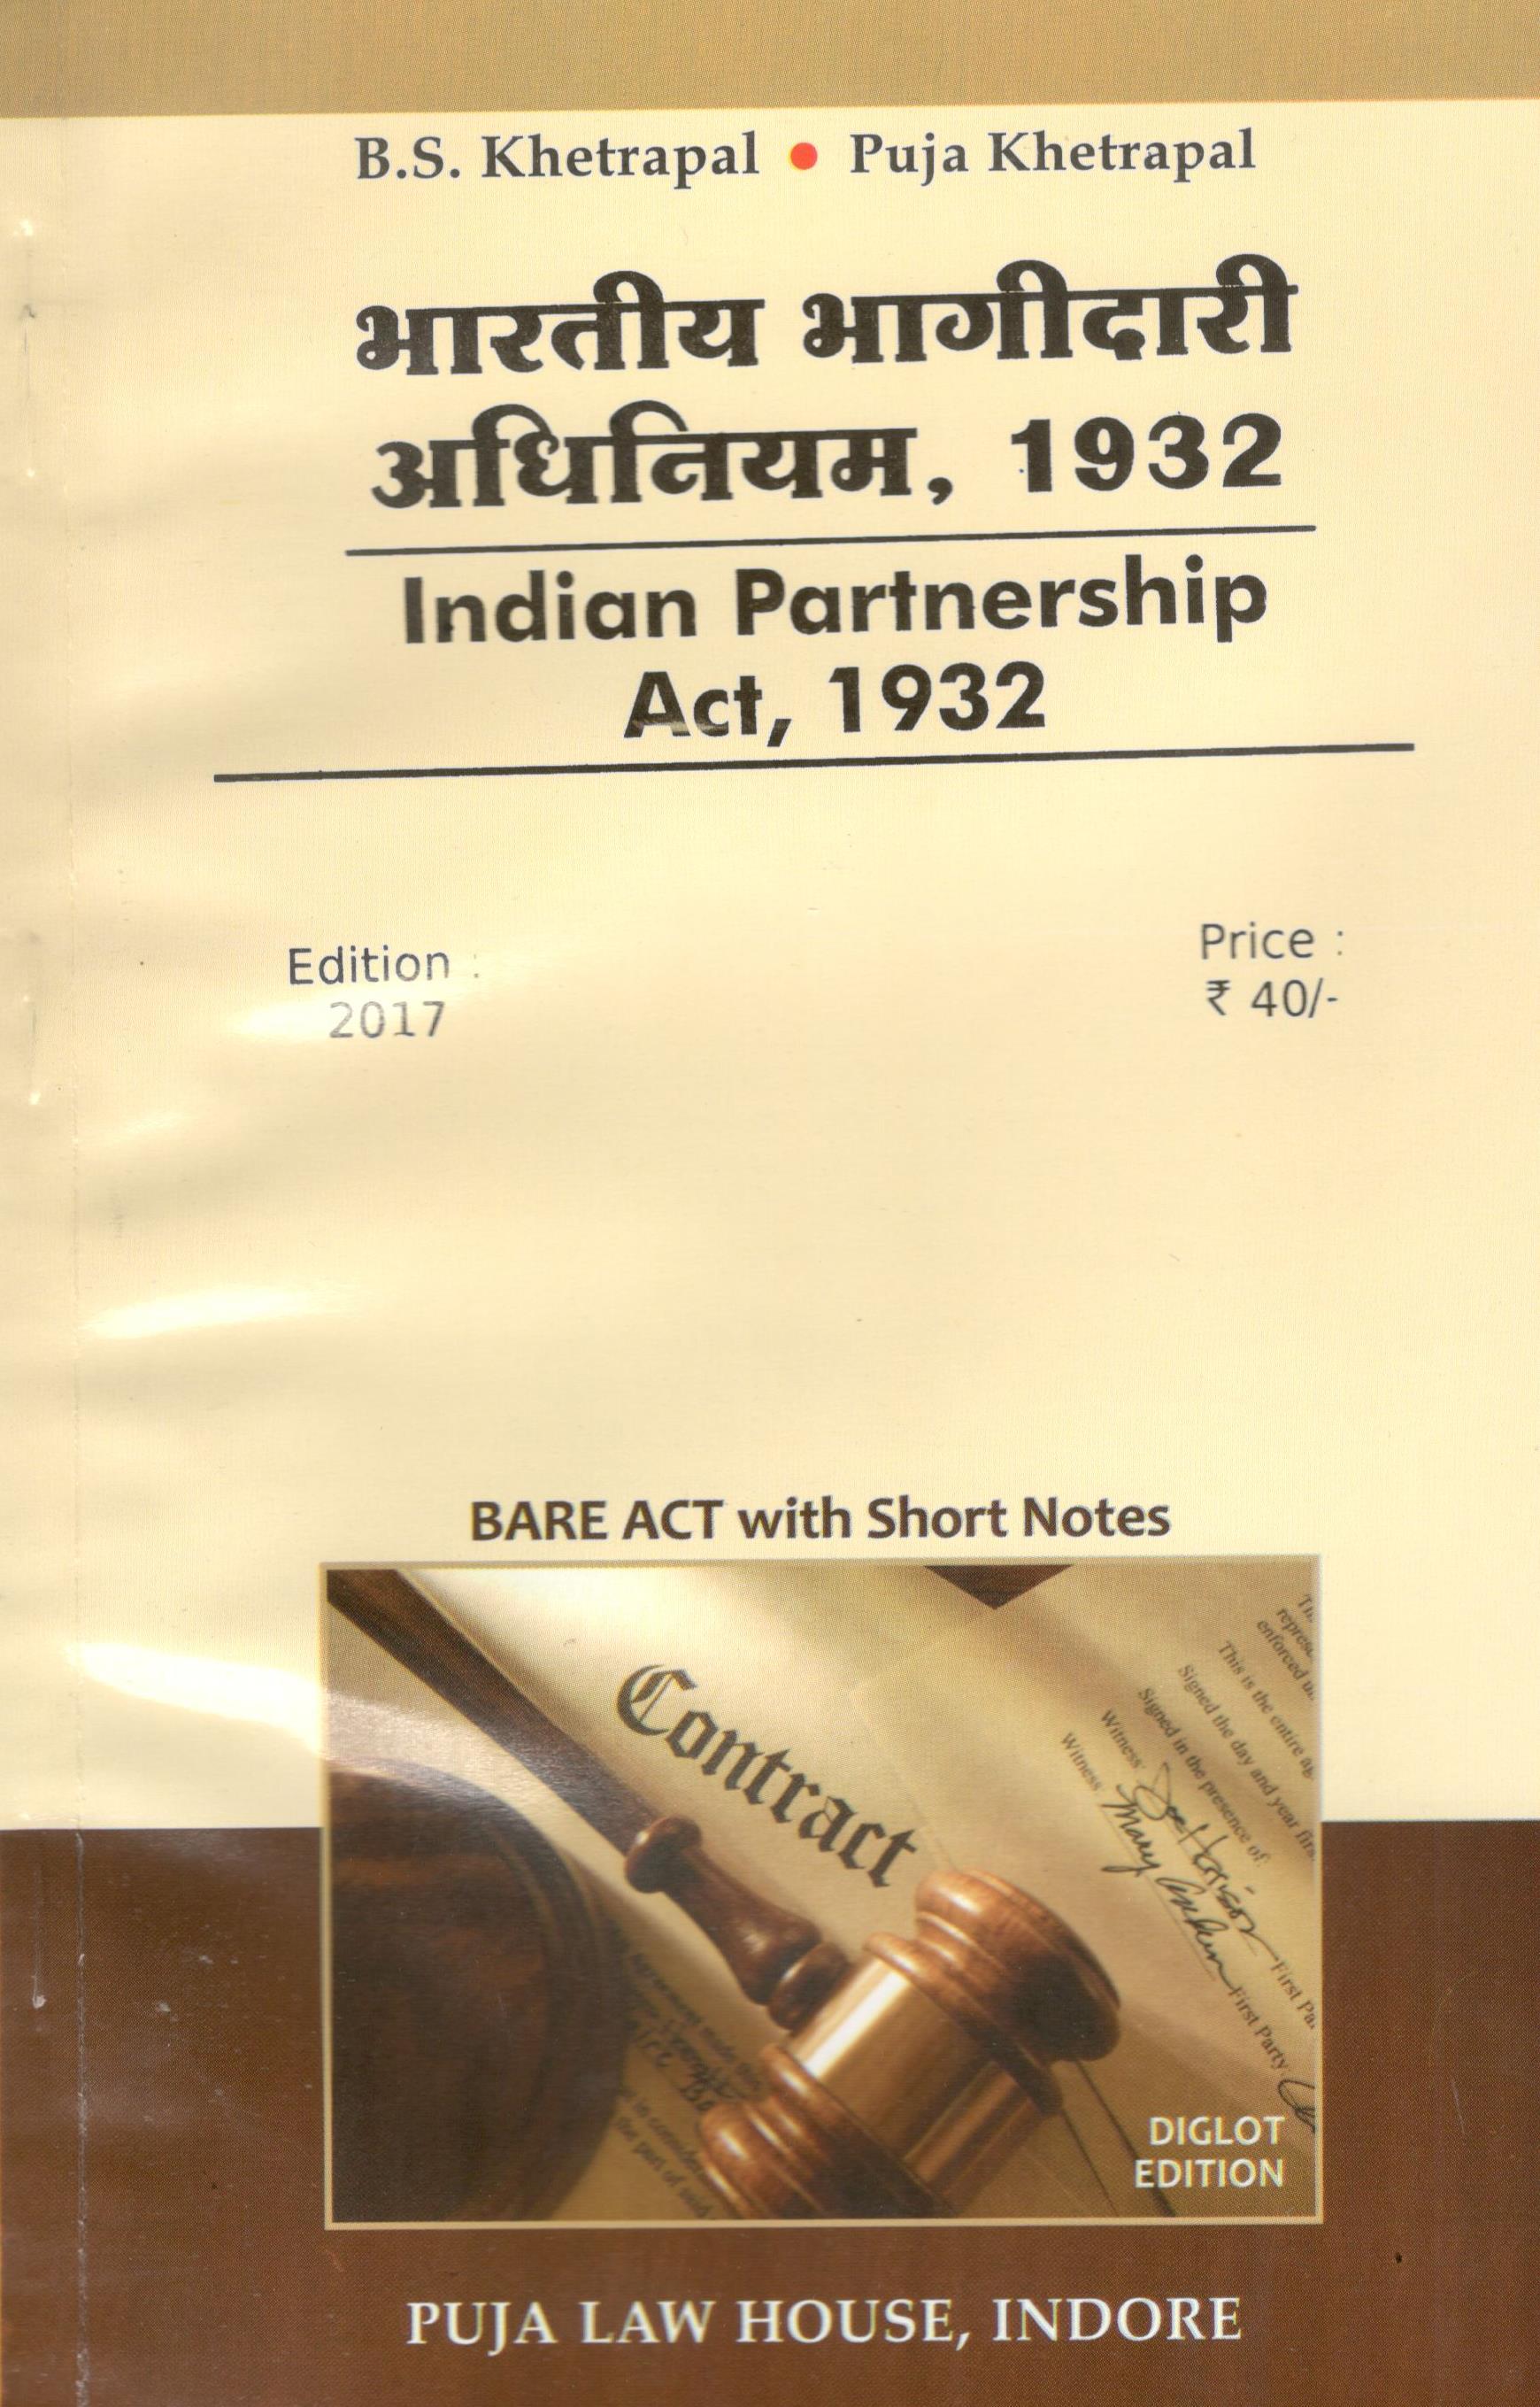 Buy भारतीय भागीदारी अधिनियम, 1932 / Indian Partnership Act, 1932